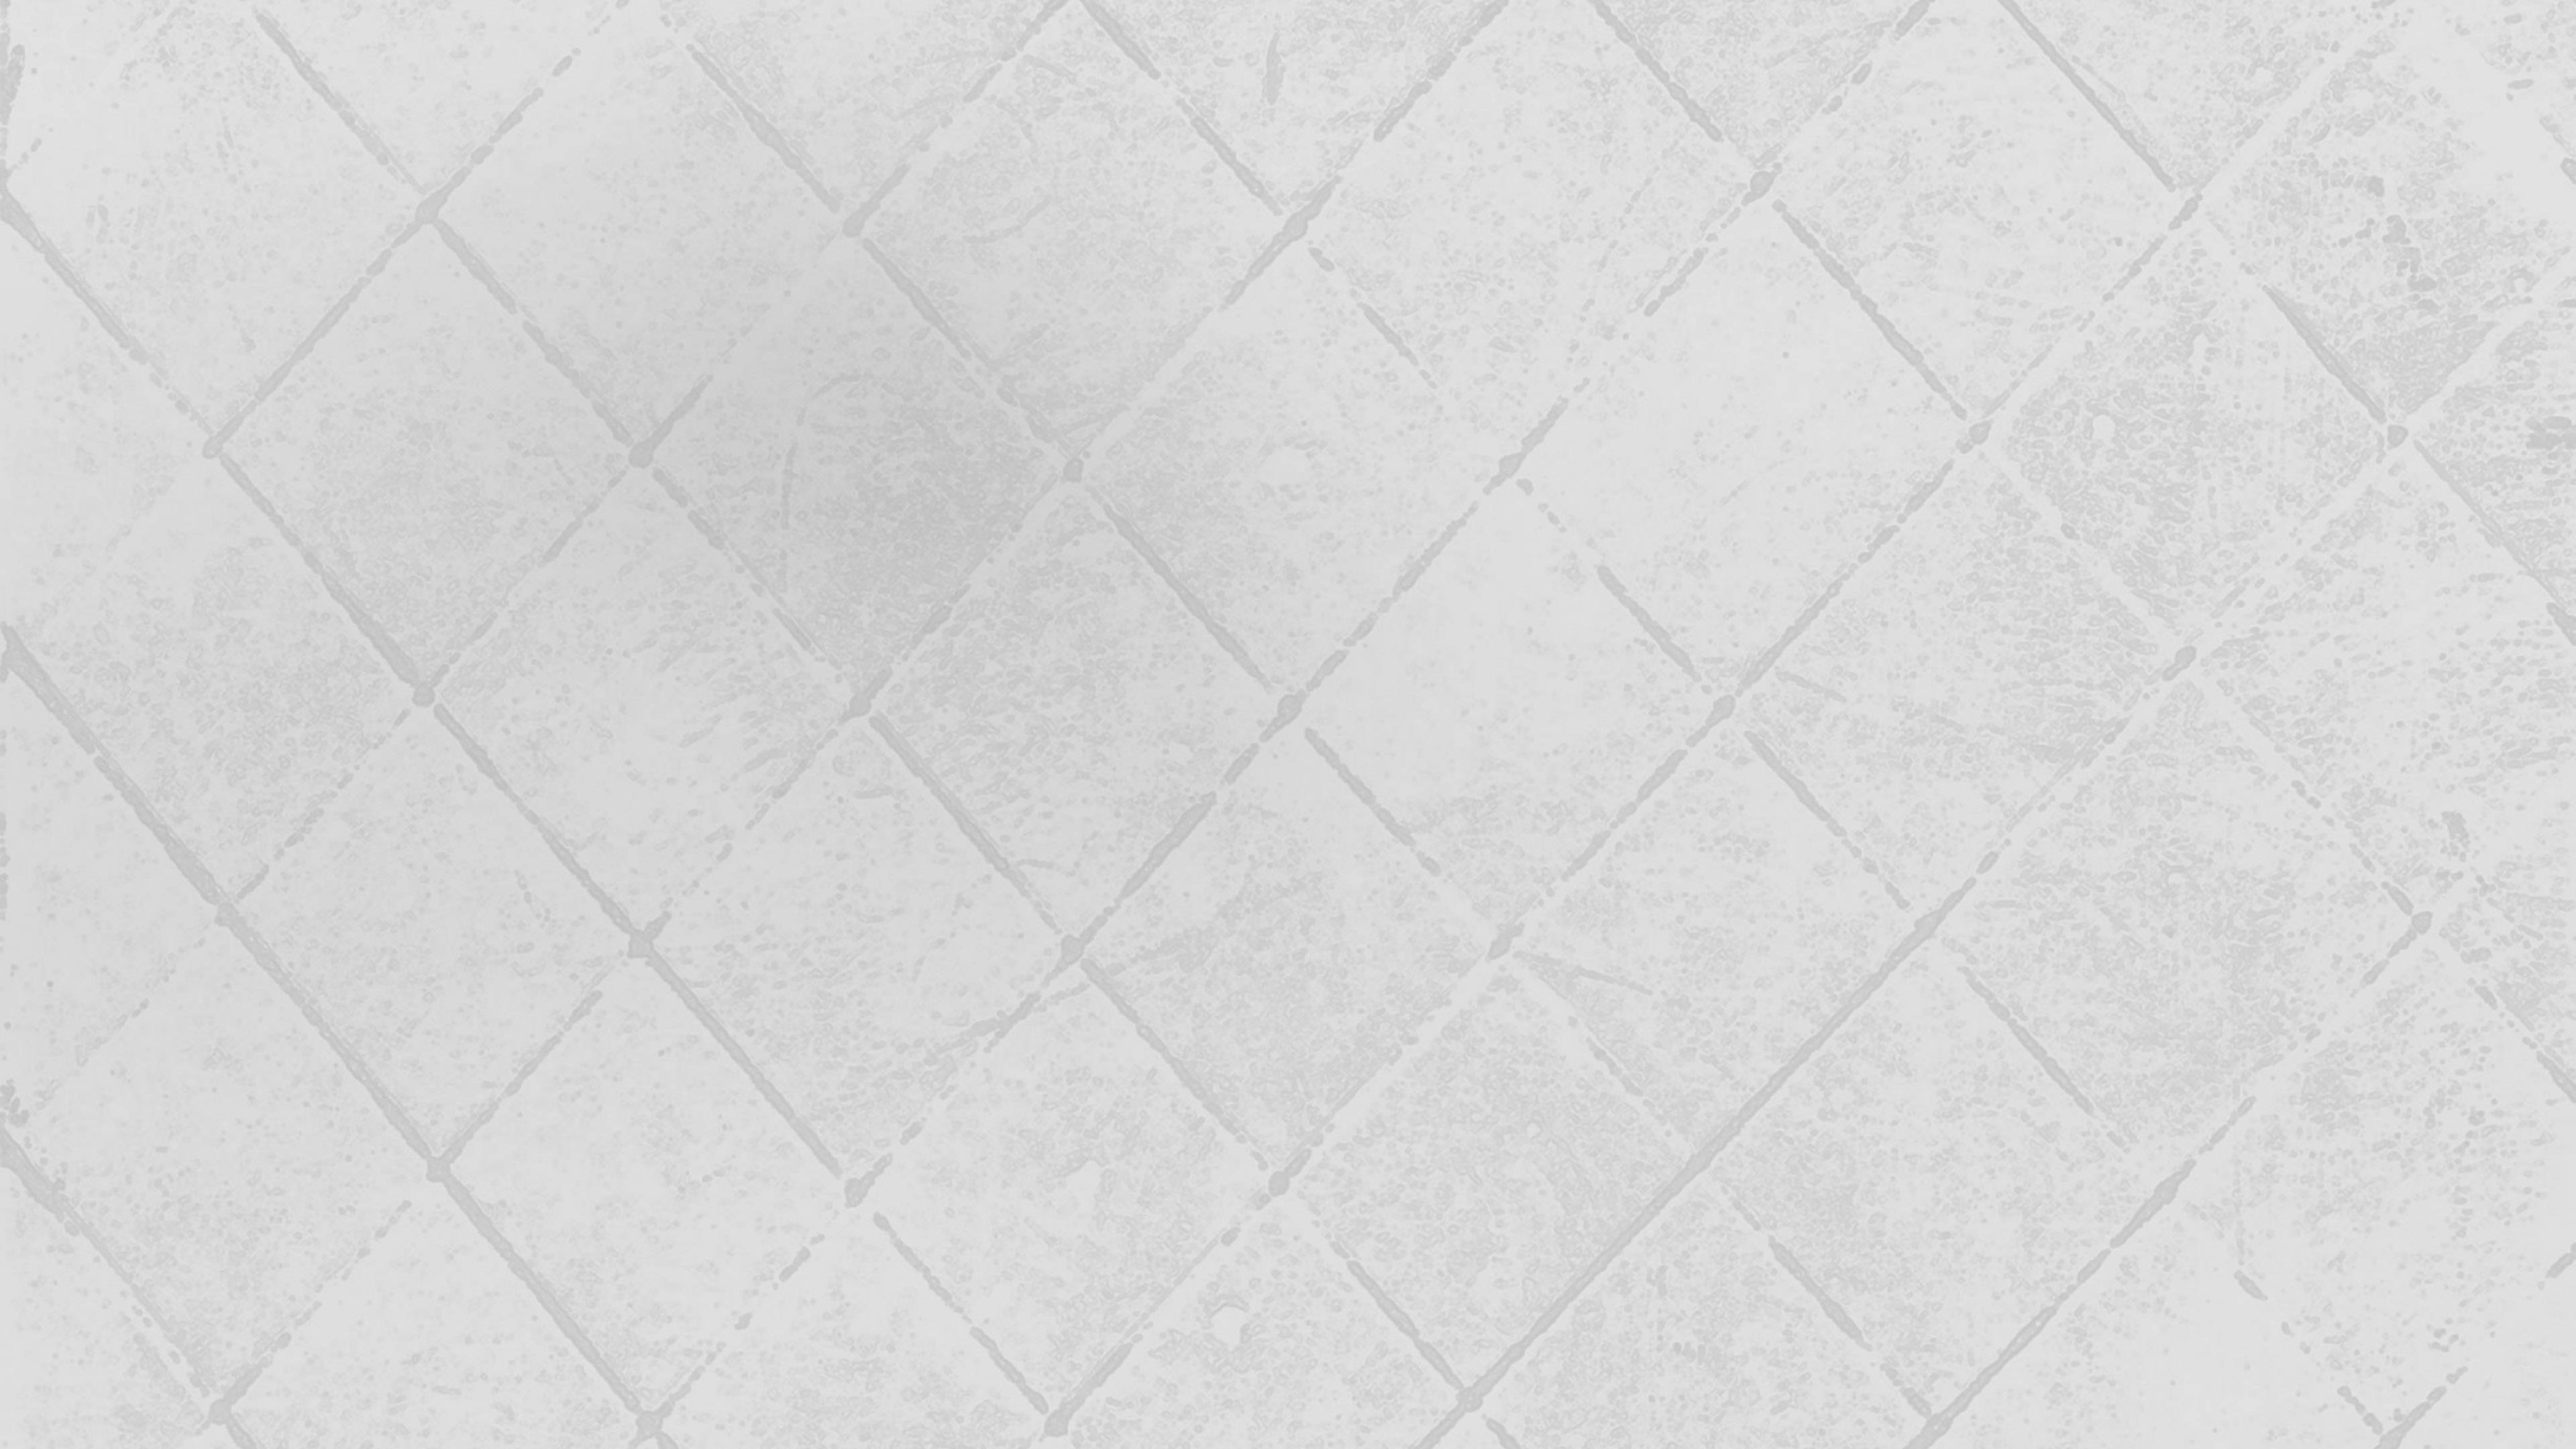 Fantastic Wallpaper Macbook Grunge - papers  Collection_74657.jpg